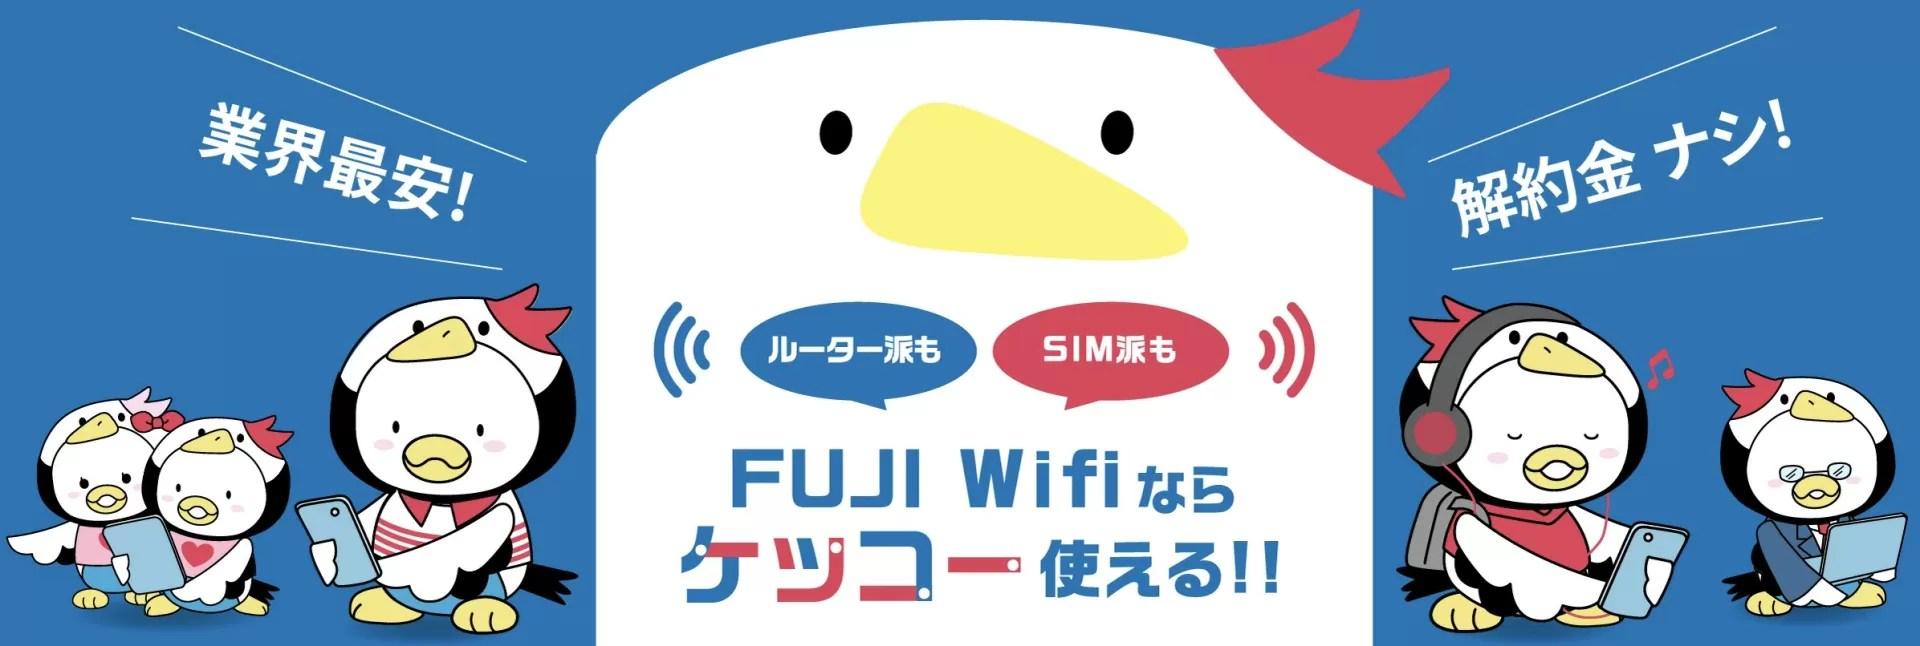 FUJI WiFi新プラン発表!ドコモ、au回線プラン追加でどう変わった?